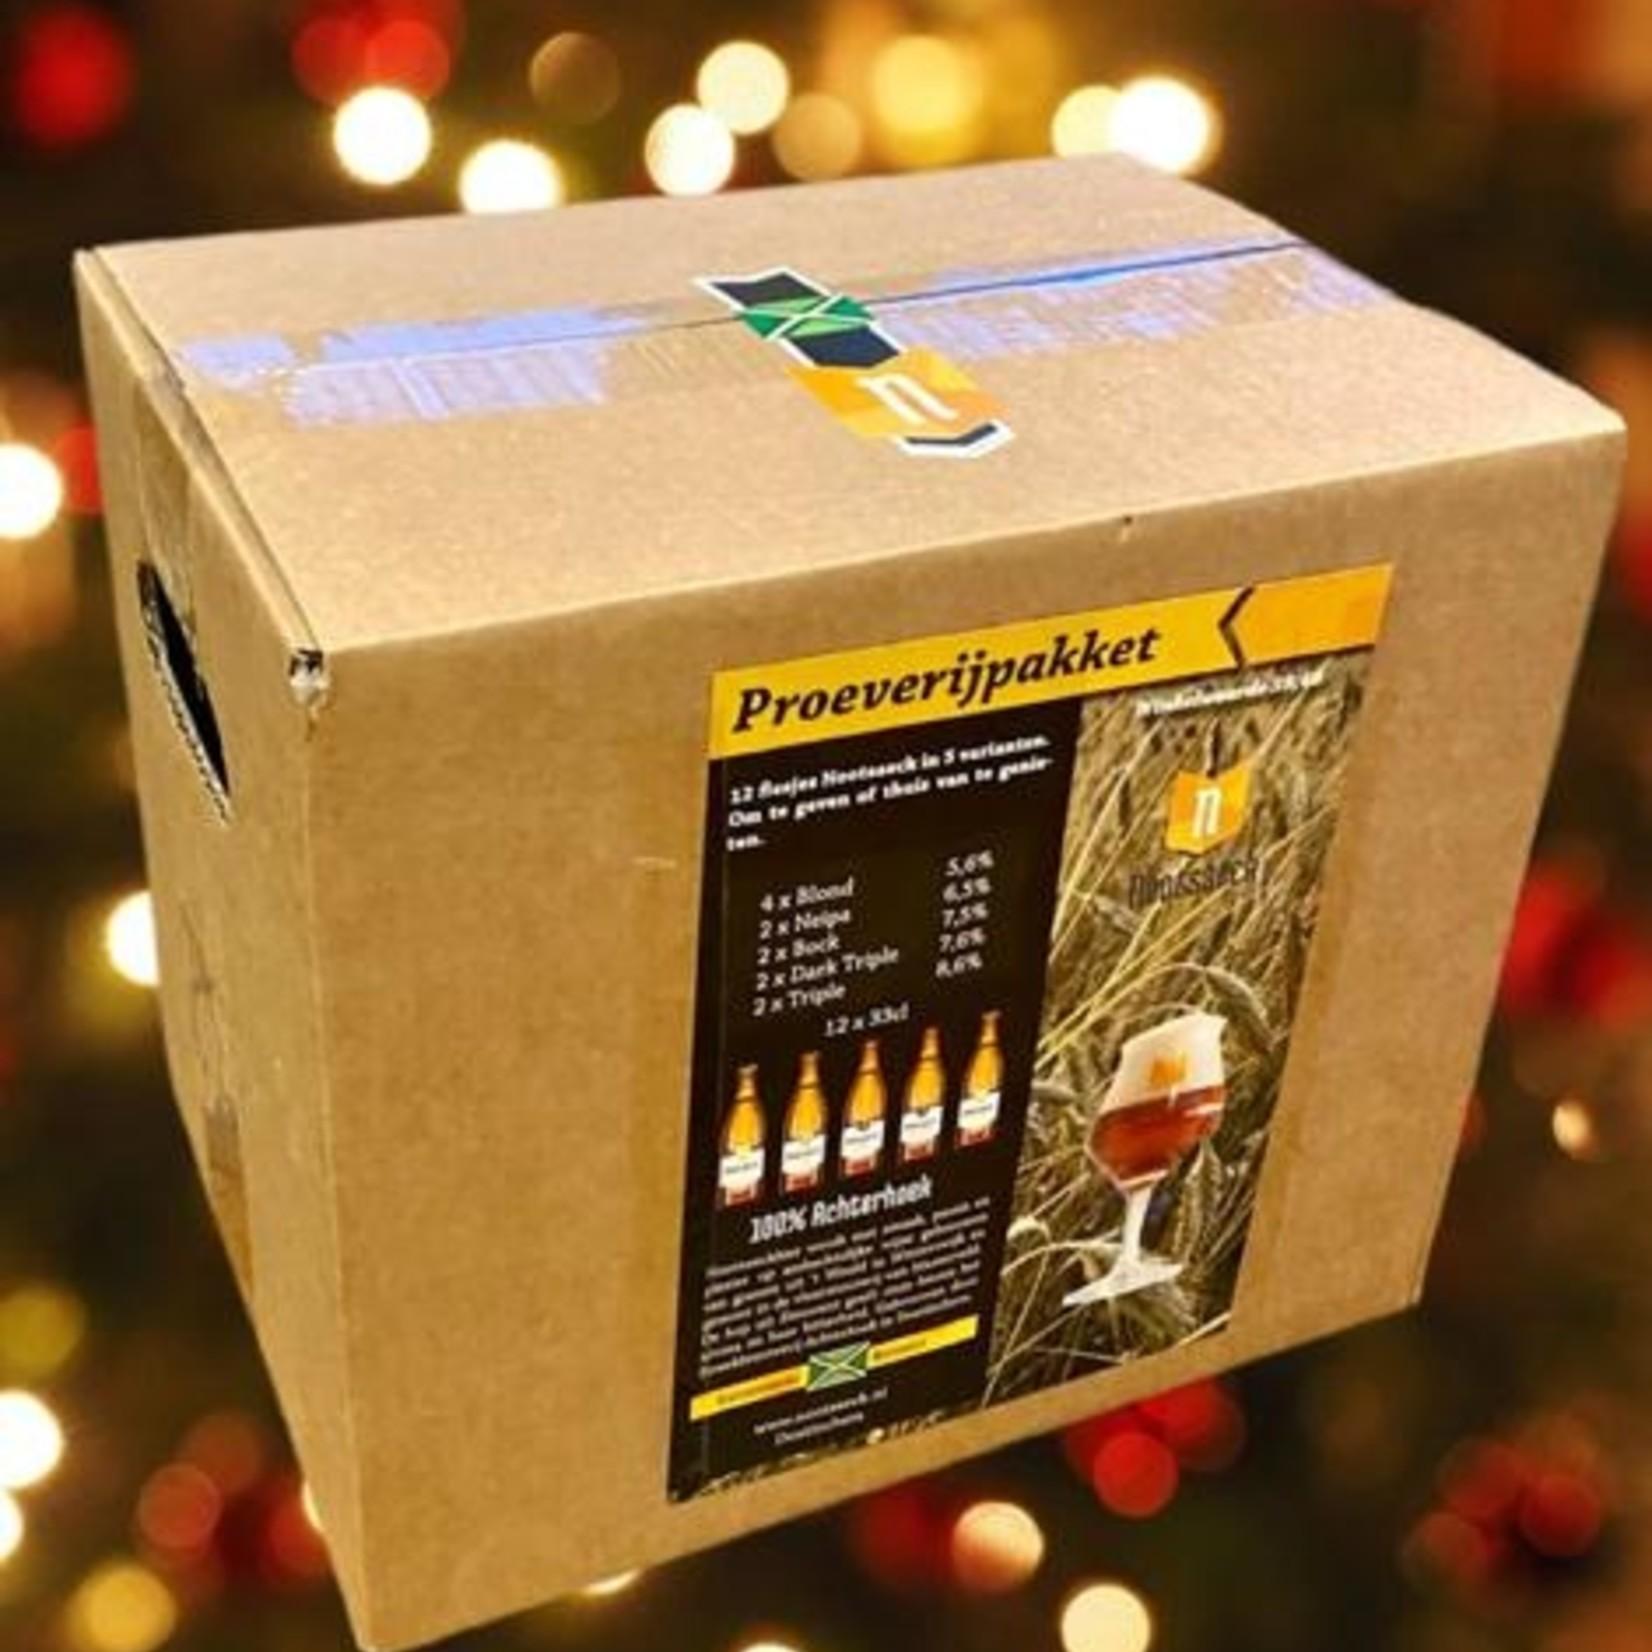 Proefpakket | groot (Nootsaeck bier)